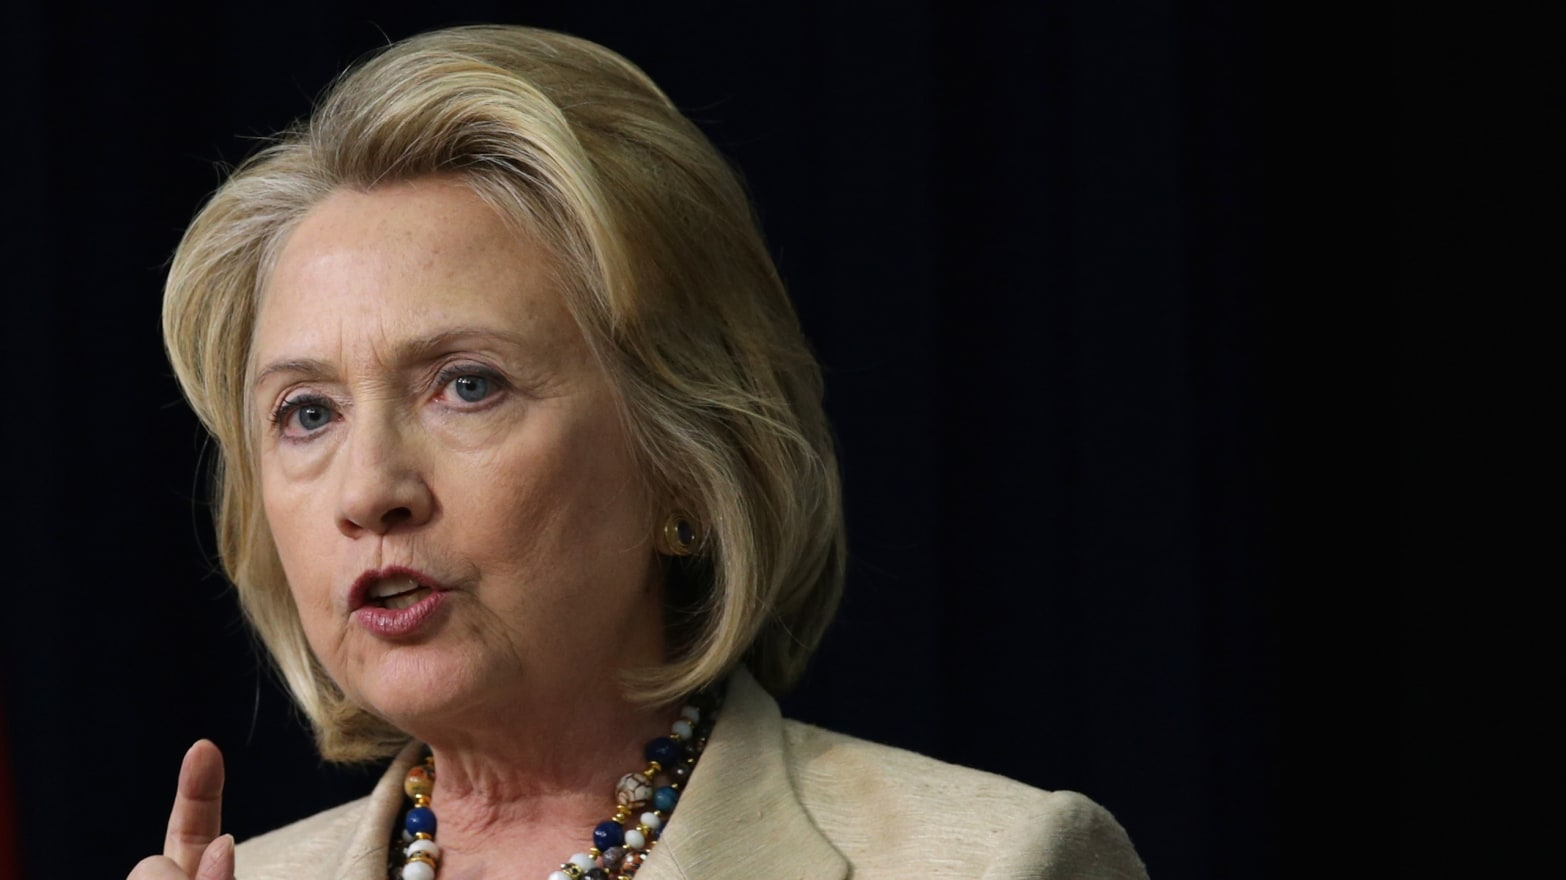 1592e8fbf Exclusive: 'Hillary Clinton Took Me Through Hell,' Rape Victim Says